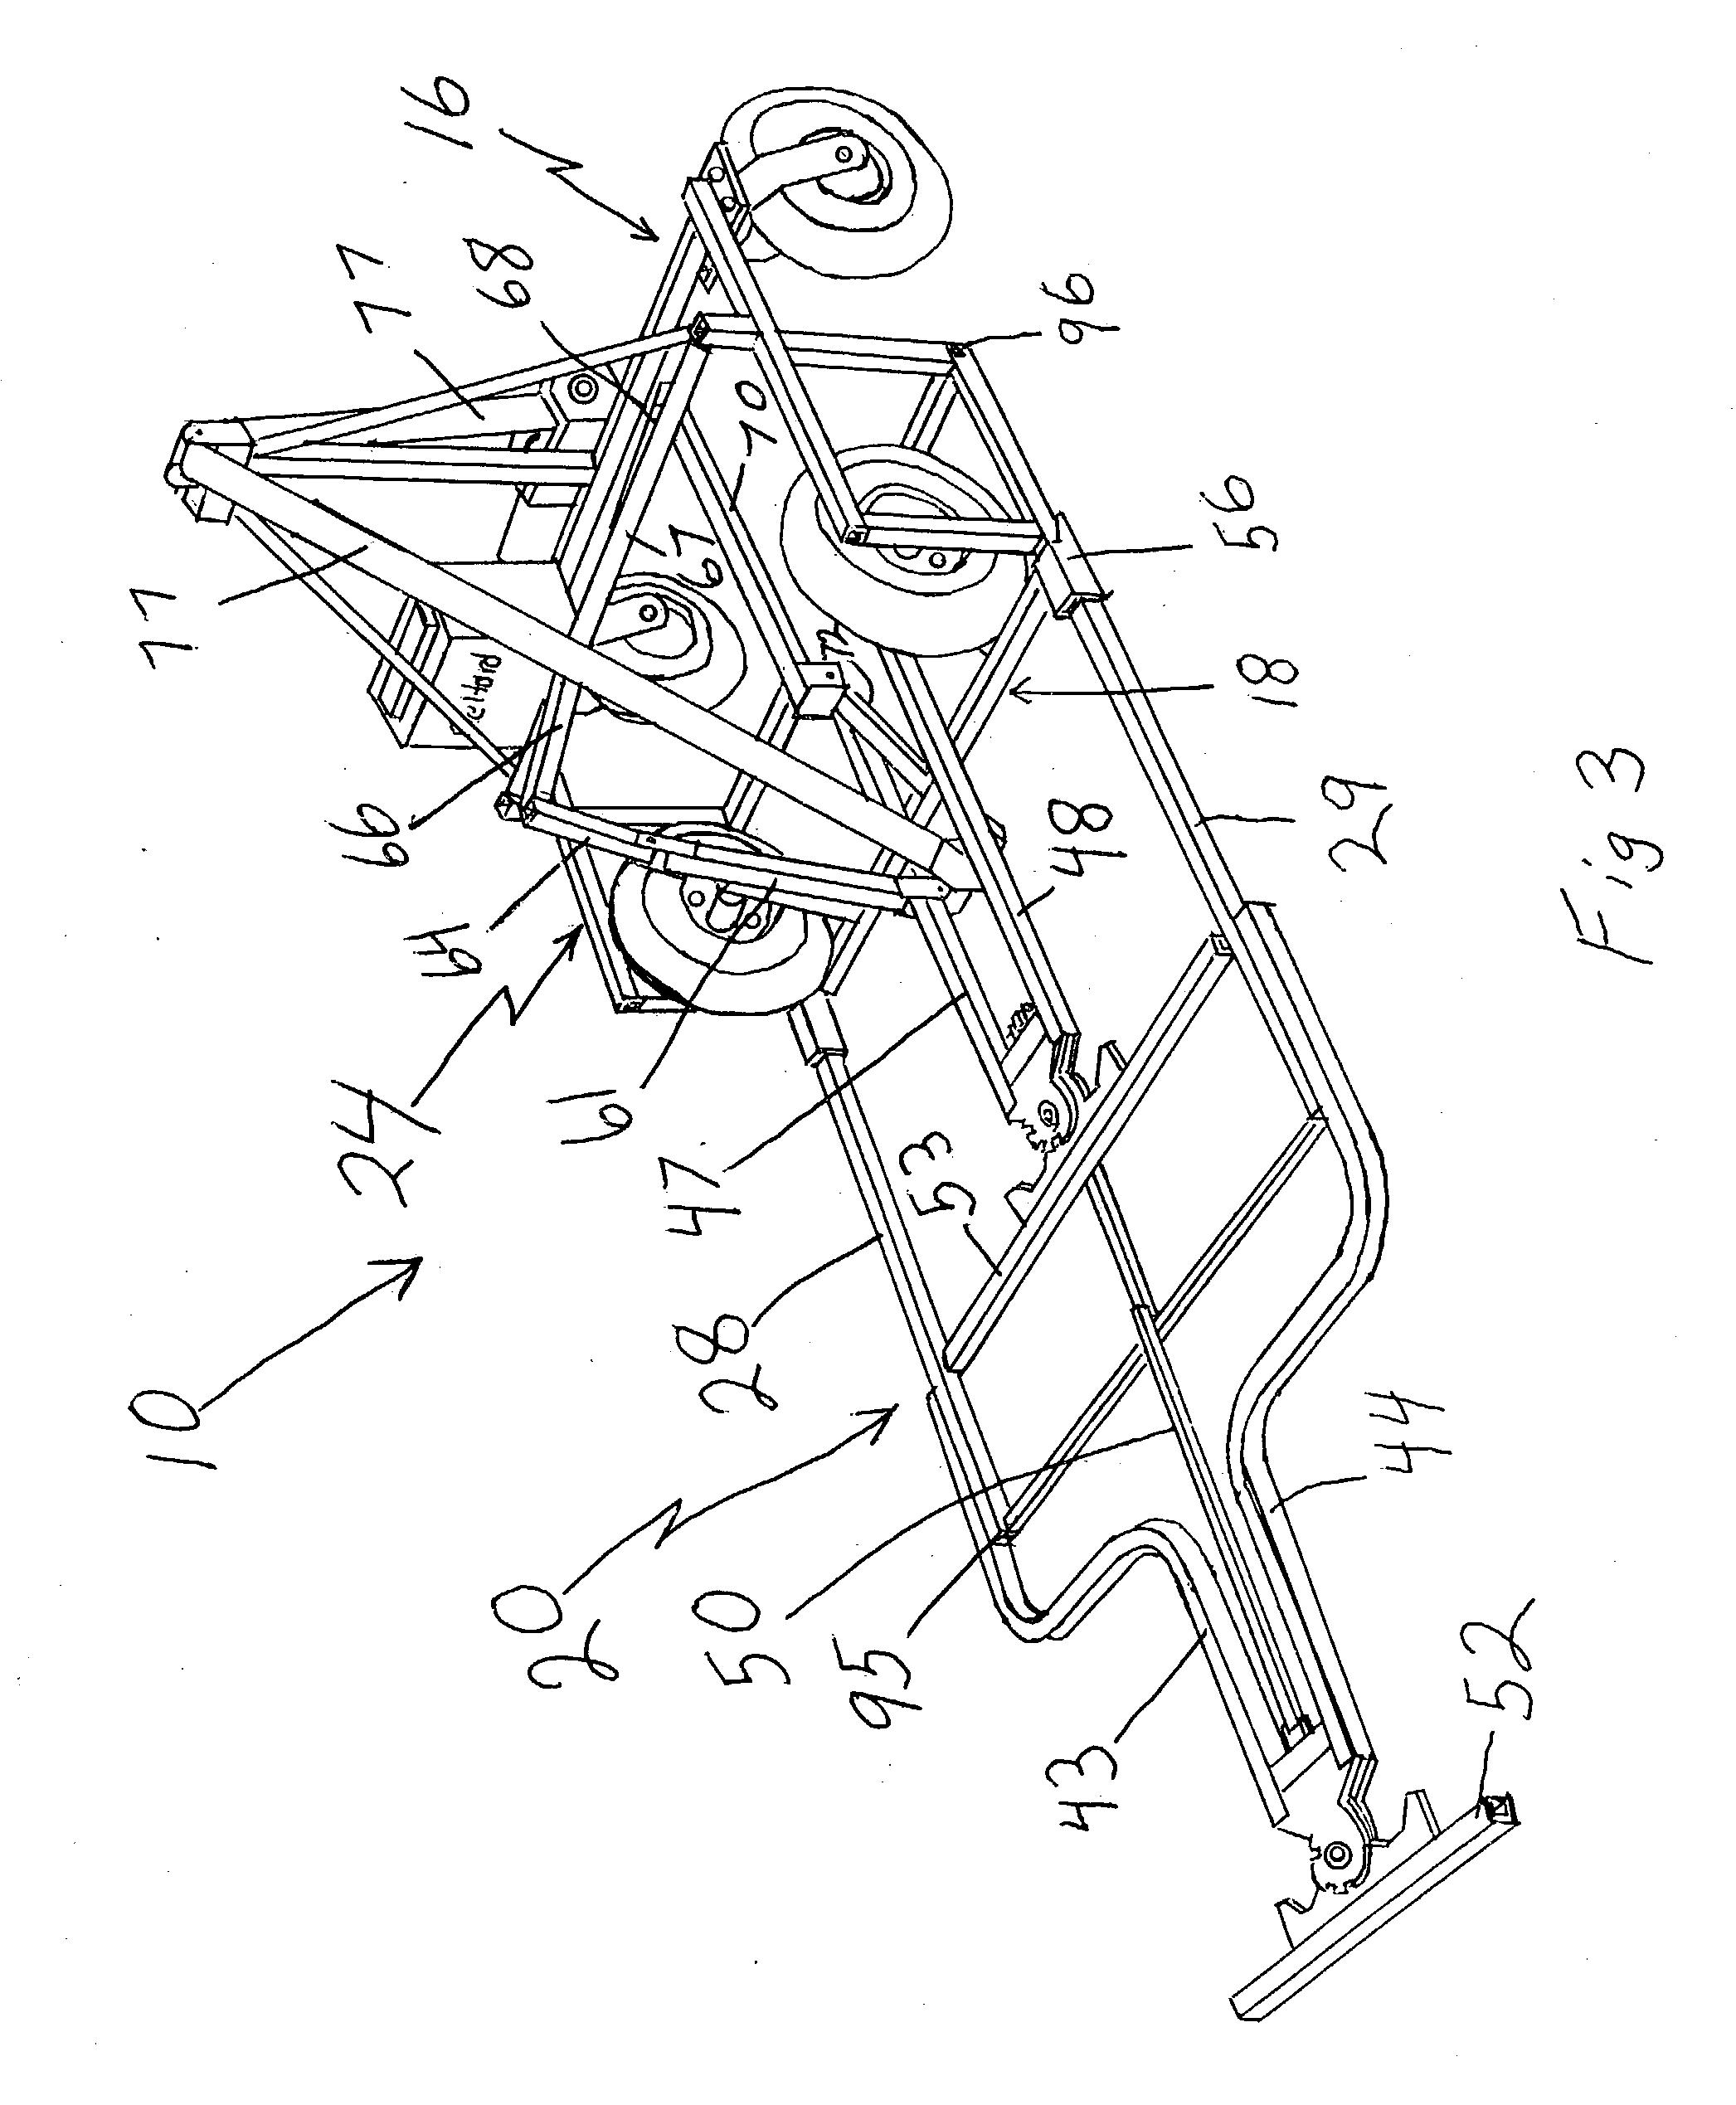 2011 polaris 500 sportsman key diagram wiring